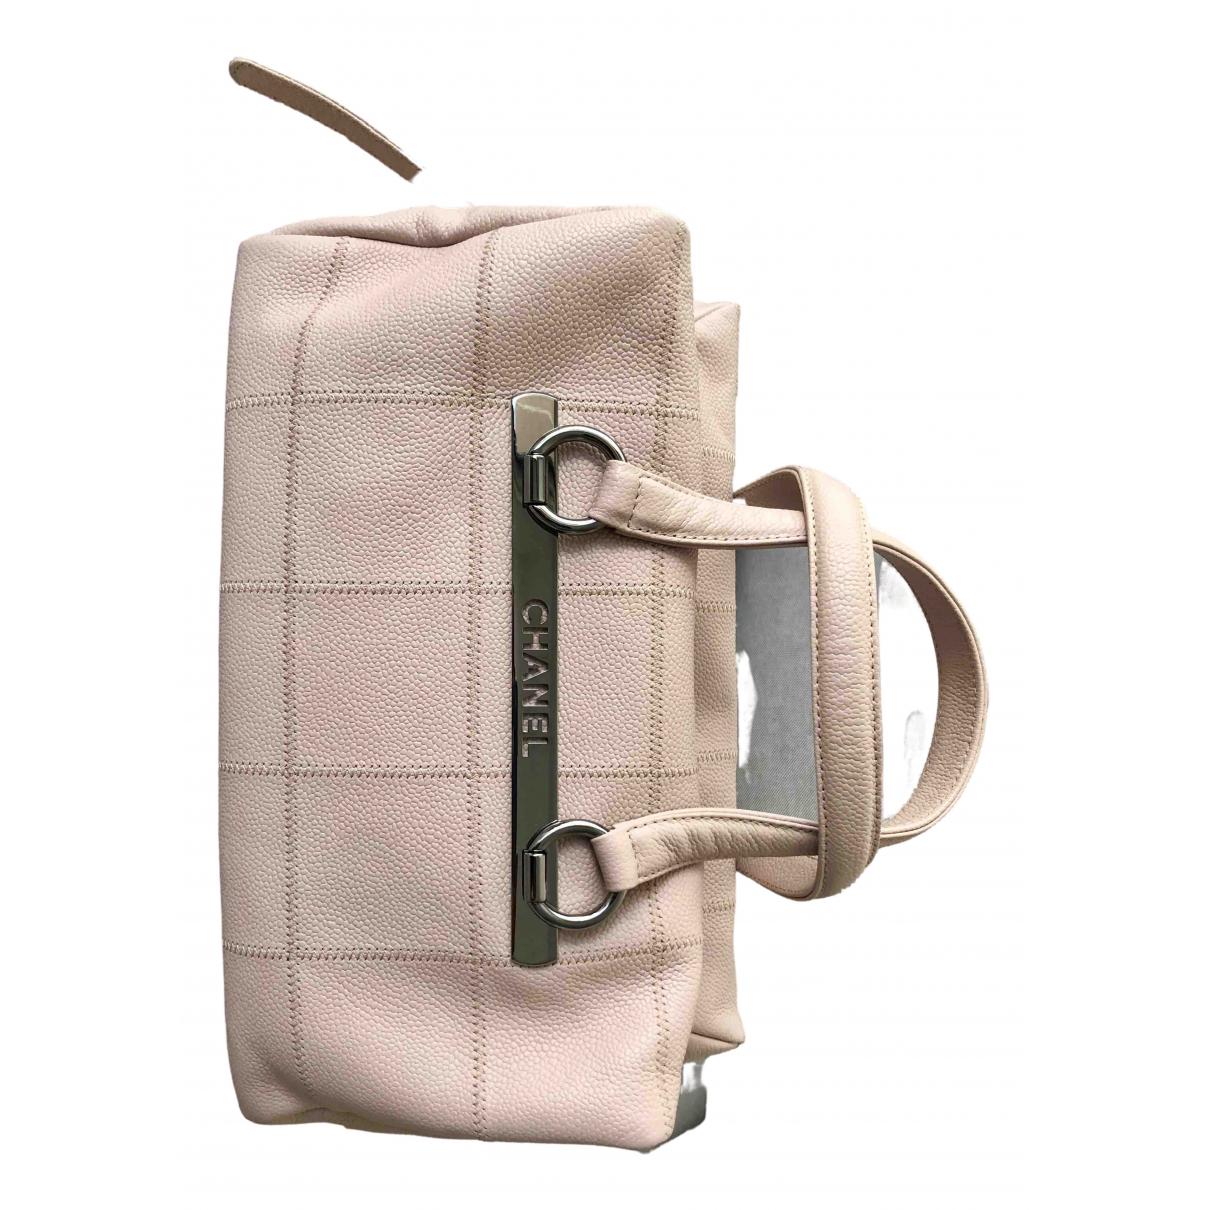 Chanel \N Pink Leather handbag for Women \N